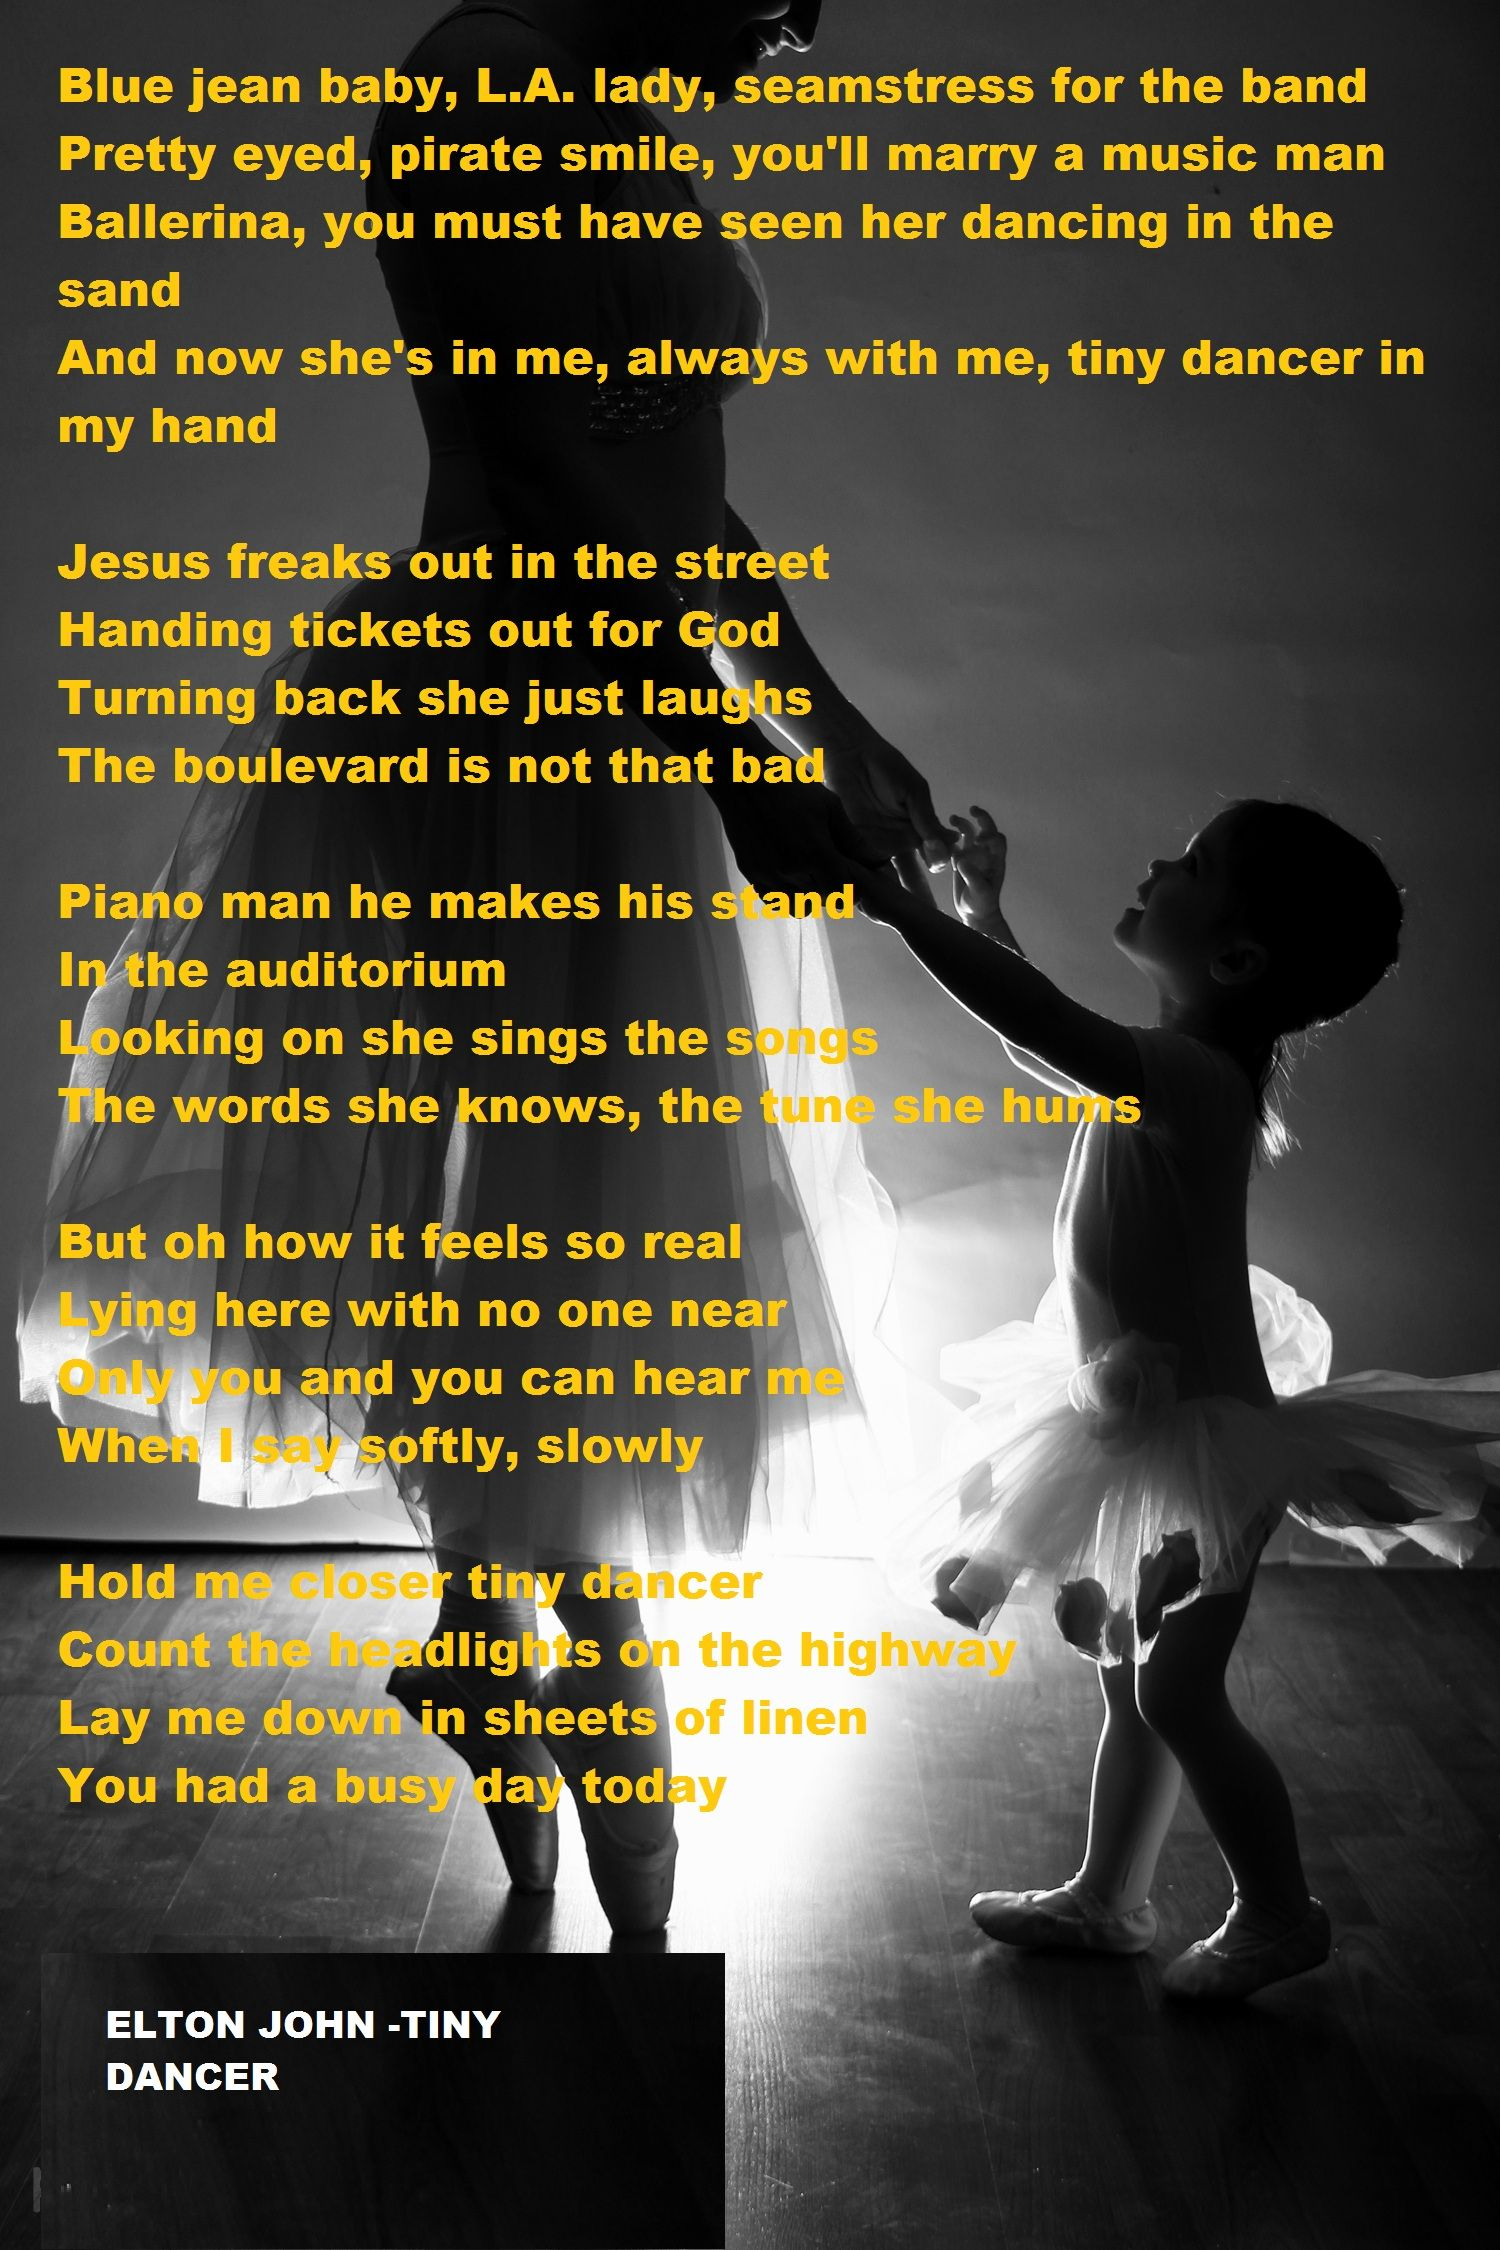 Elton John - Tiny Dancer  One of my all time favorites